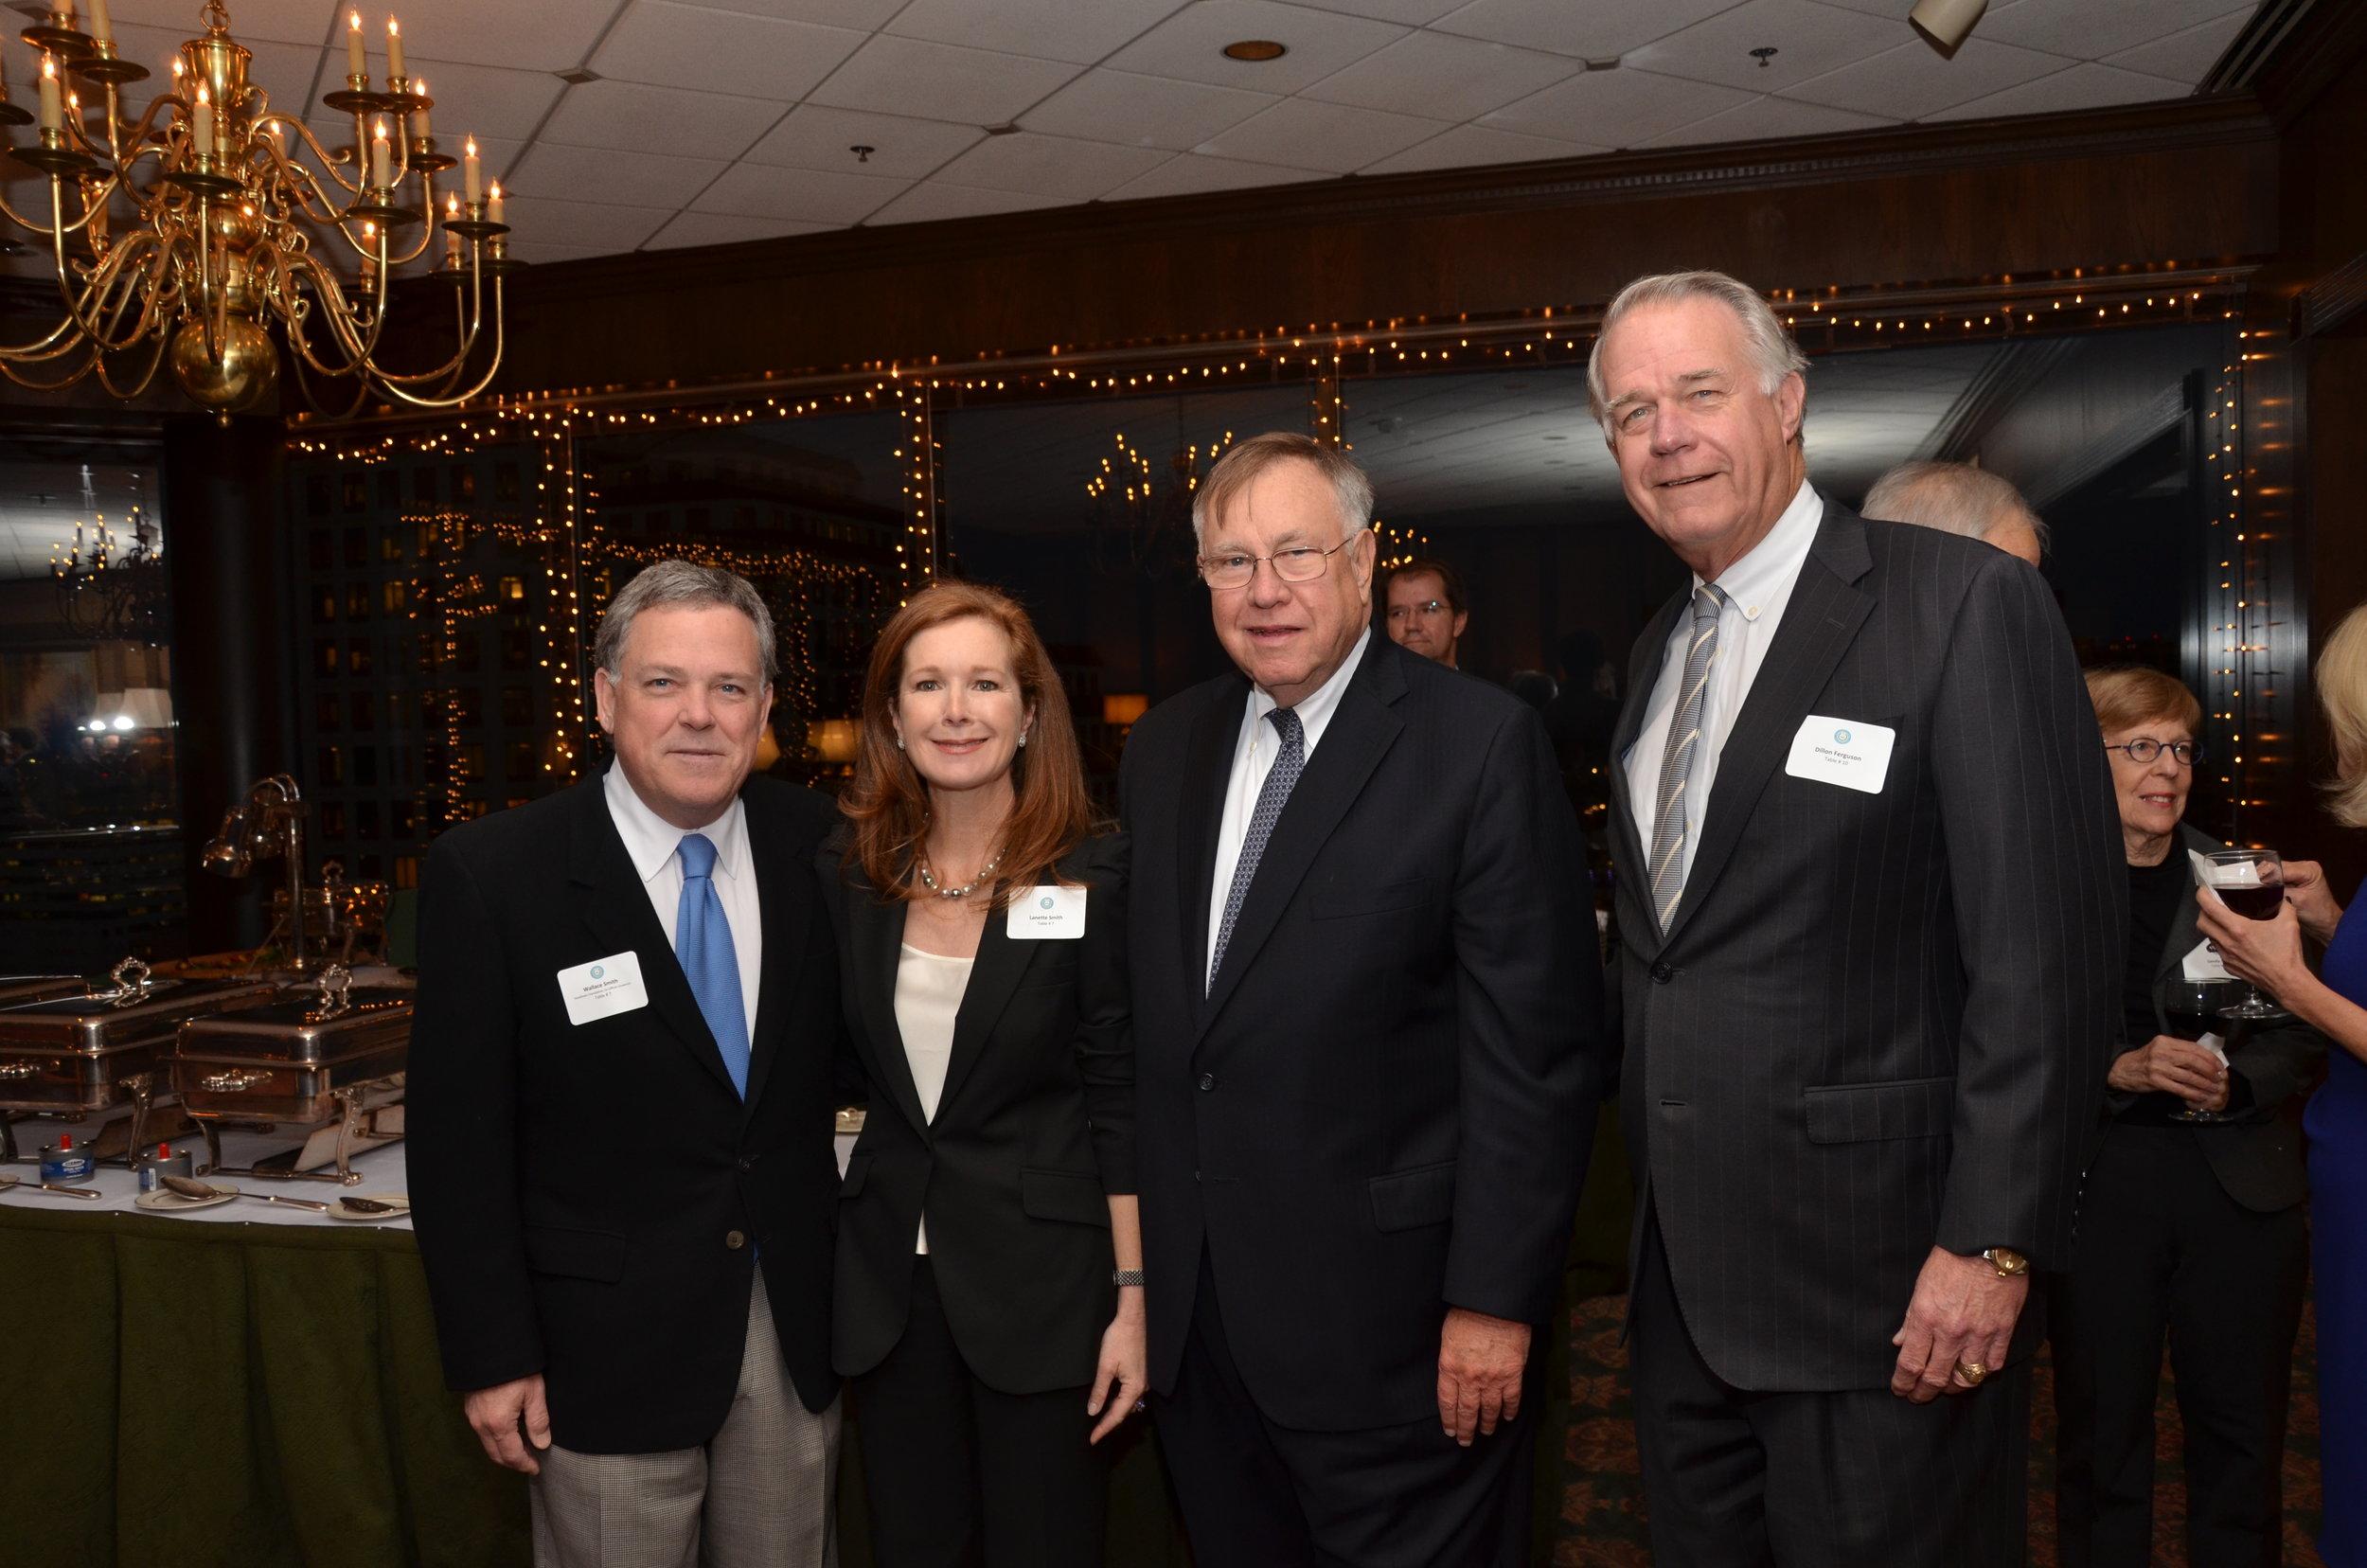 2_Club-President-Wallace-and-Lanette-Smith-John-Fainter-and-Dillon-Ferguson.jpg